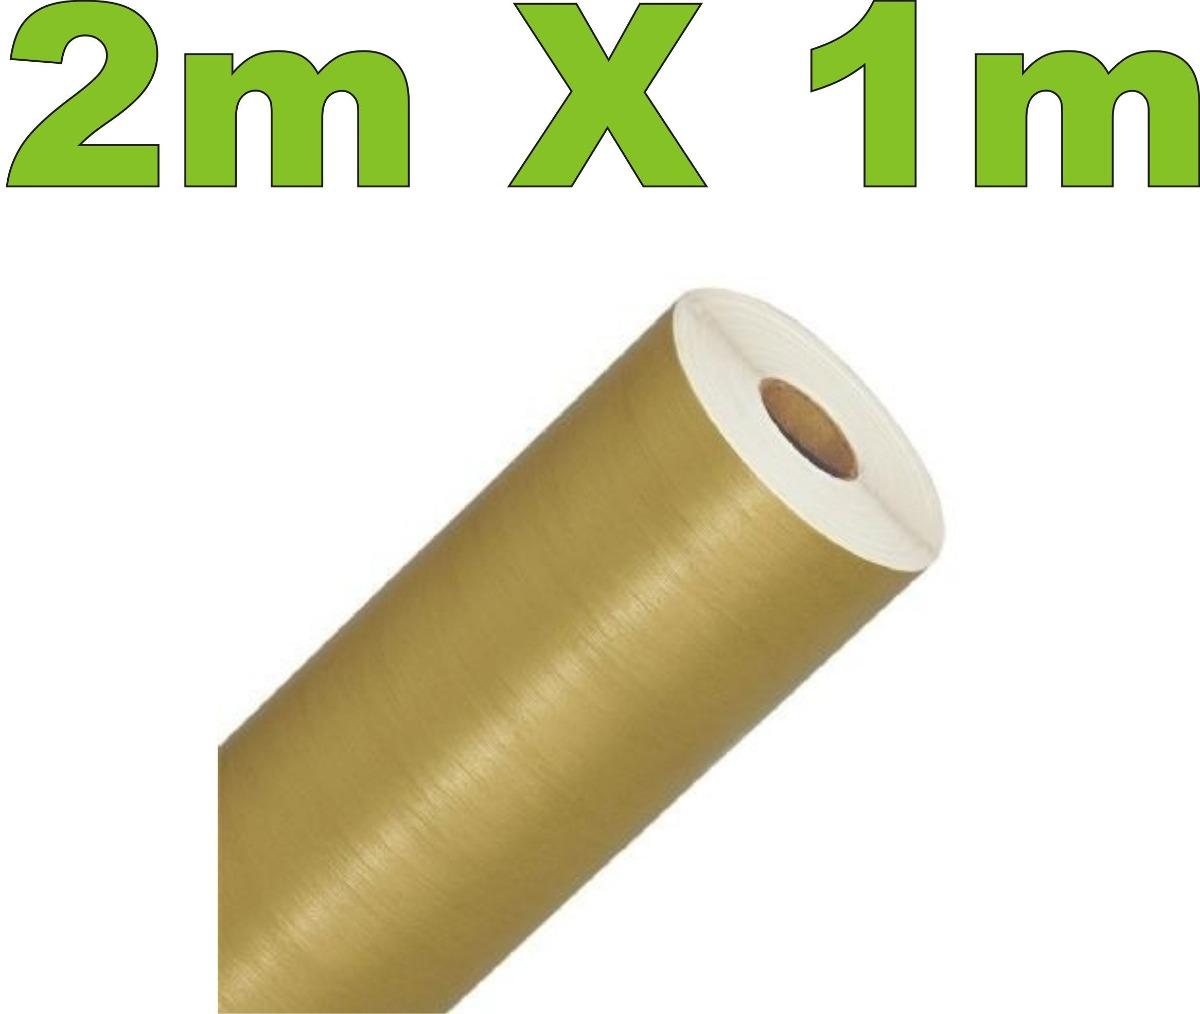 adesivo-aco-escovado-dourado-envelopamento-automotivo-2mx1m-d_nq_np_827301-mlb20310397931_052015-f.jpg